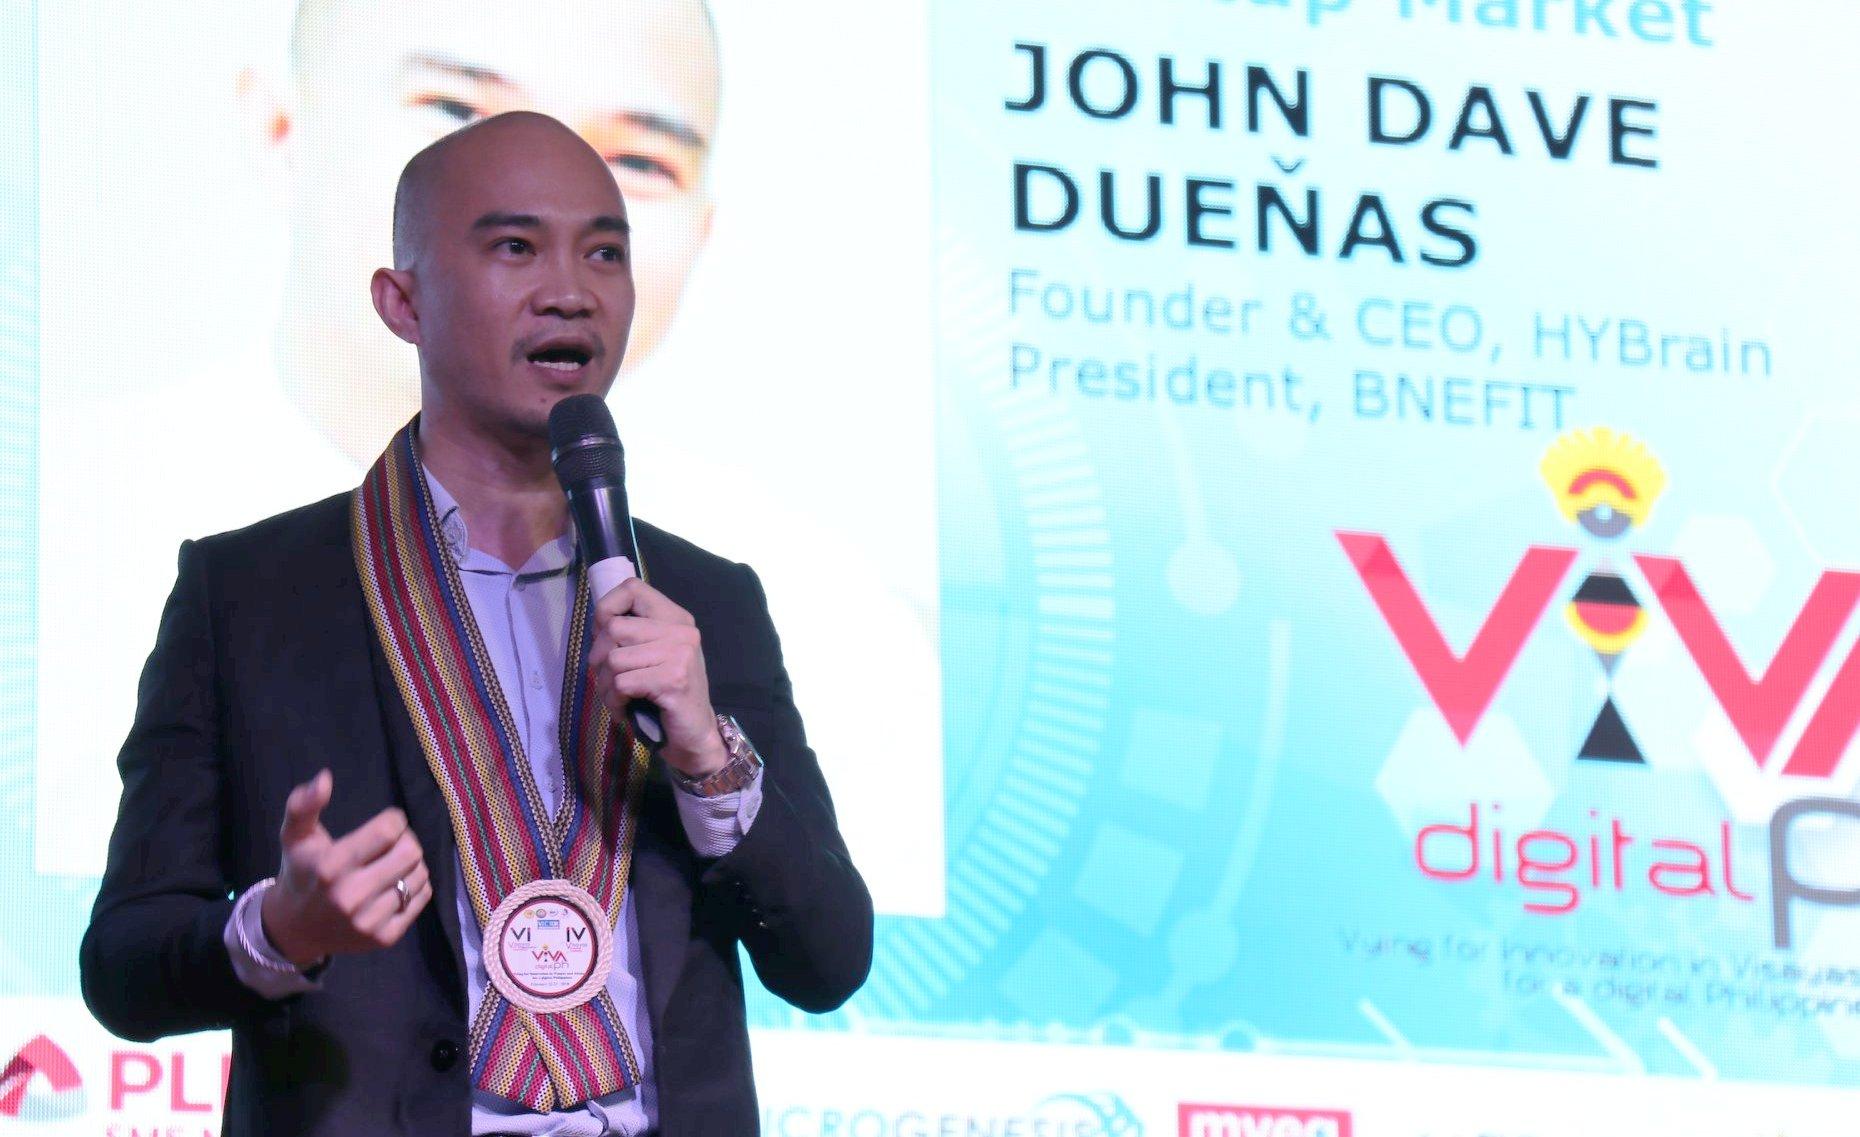 BNEFIT President John Dave Dueñas